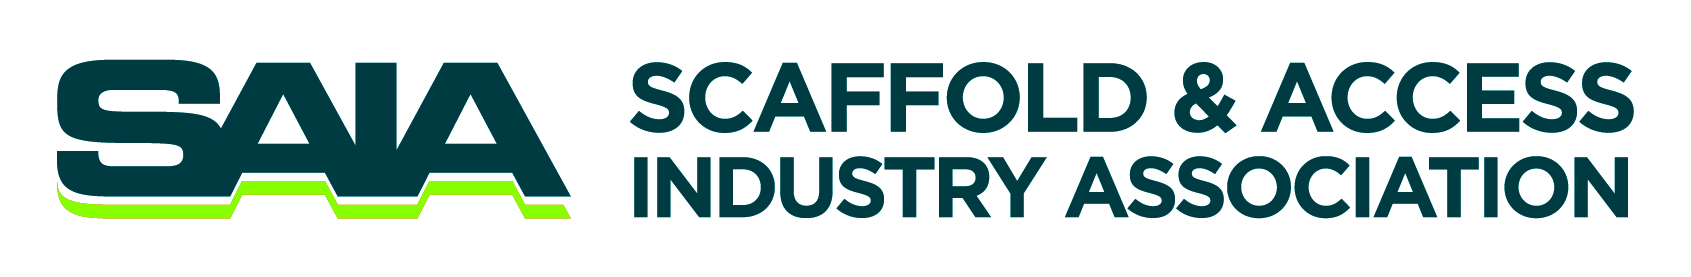 Scaffold & Access Industry Association